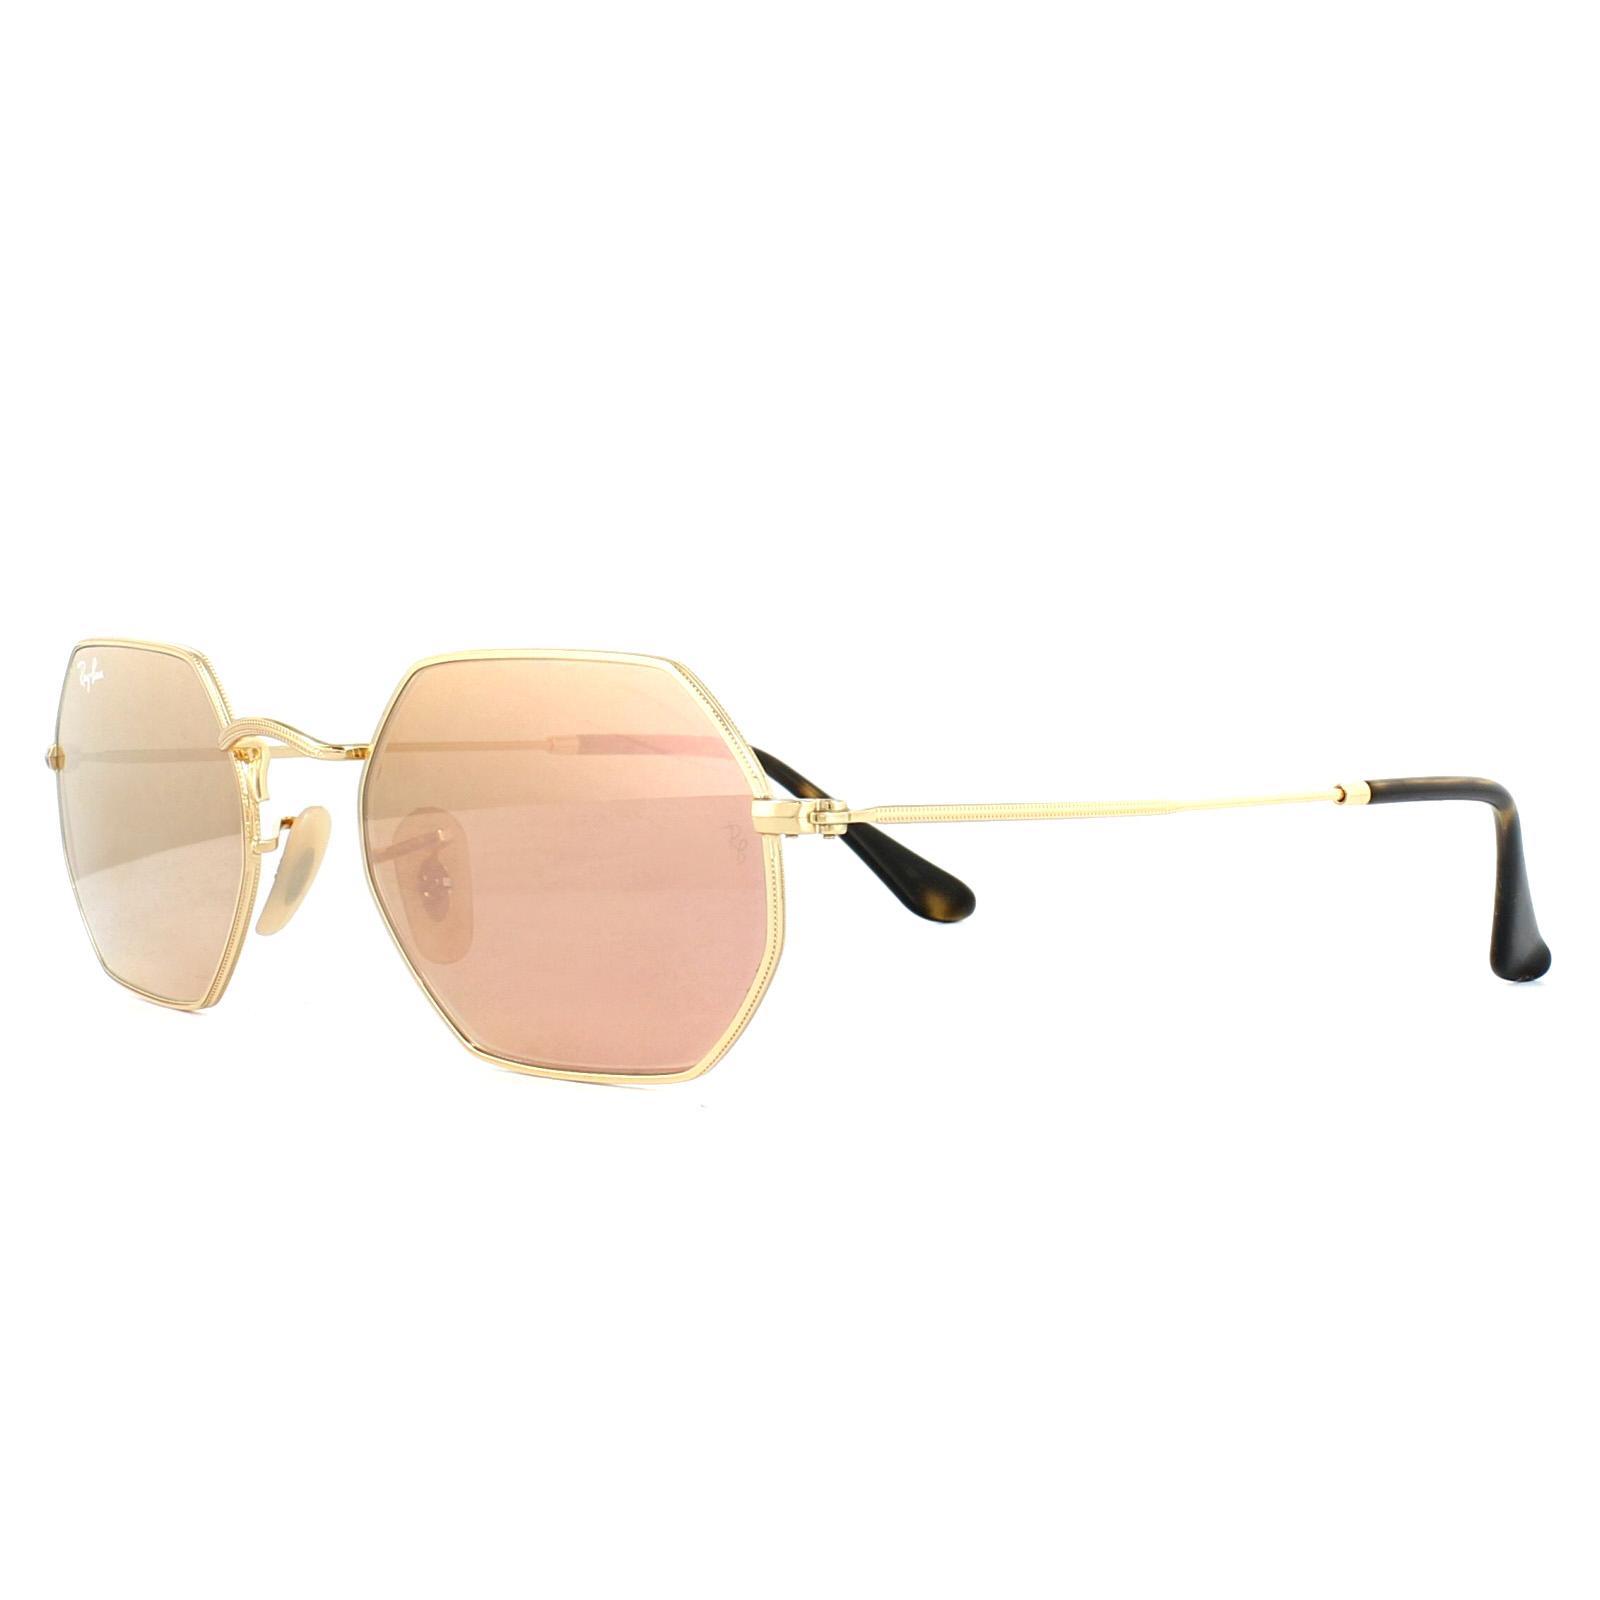 c71a24666d547 Sentinel Ray-Ban Sunglasses Octagonal 3556N 001 Z2 Gold Copper Mirror